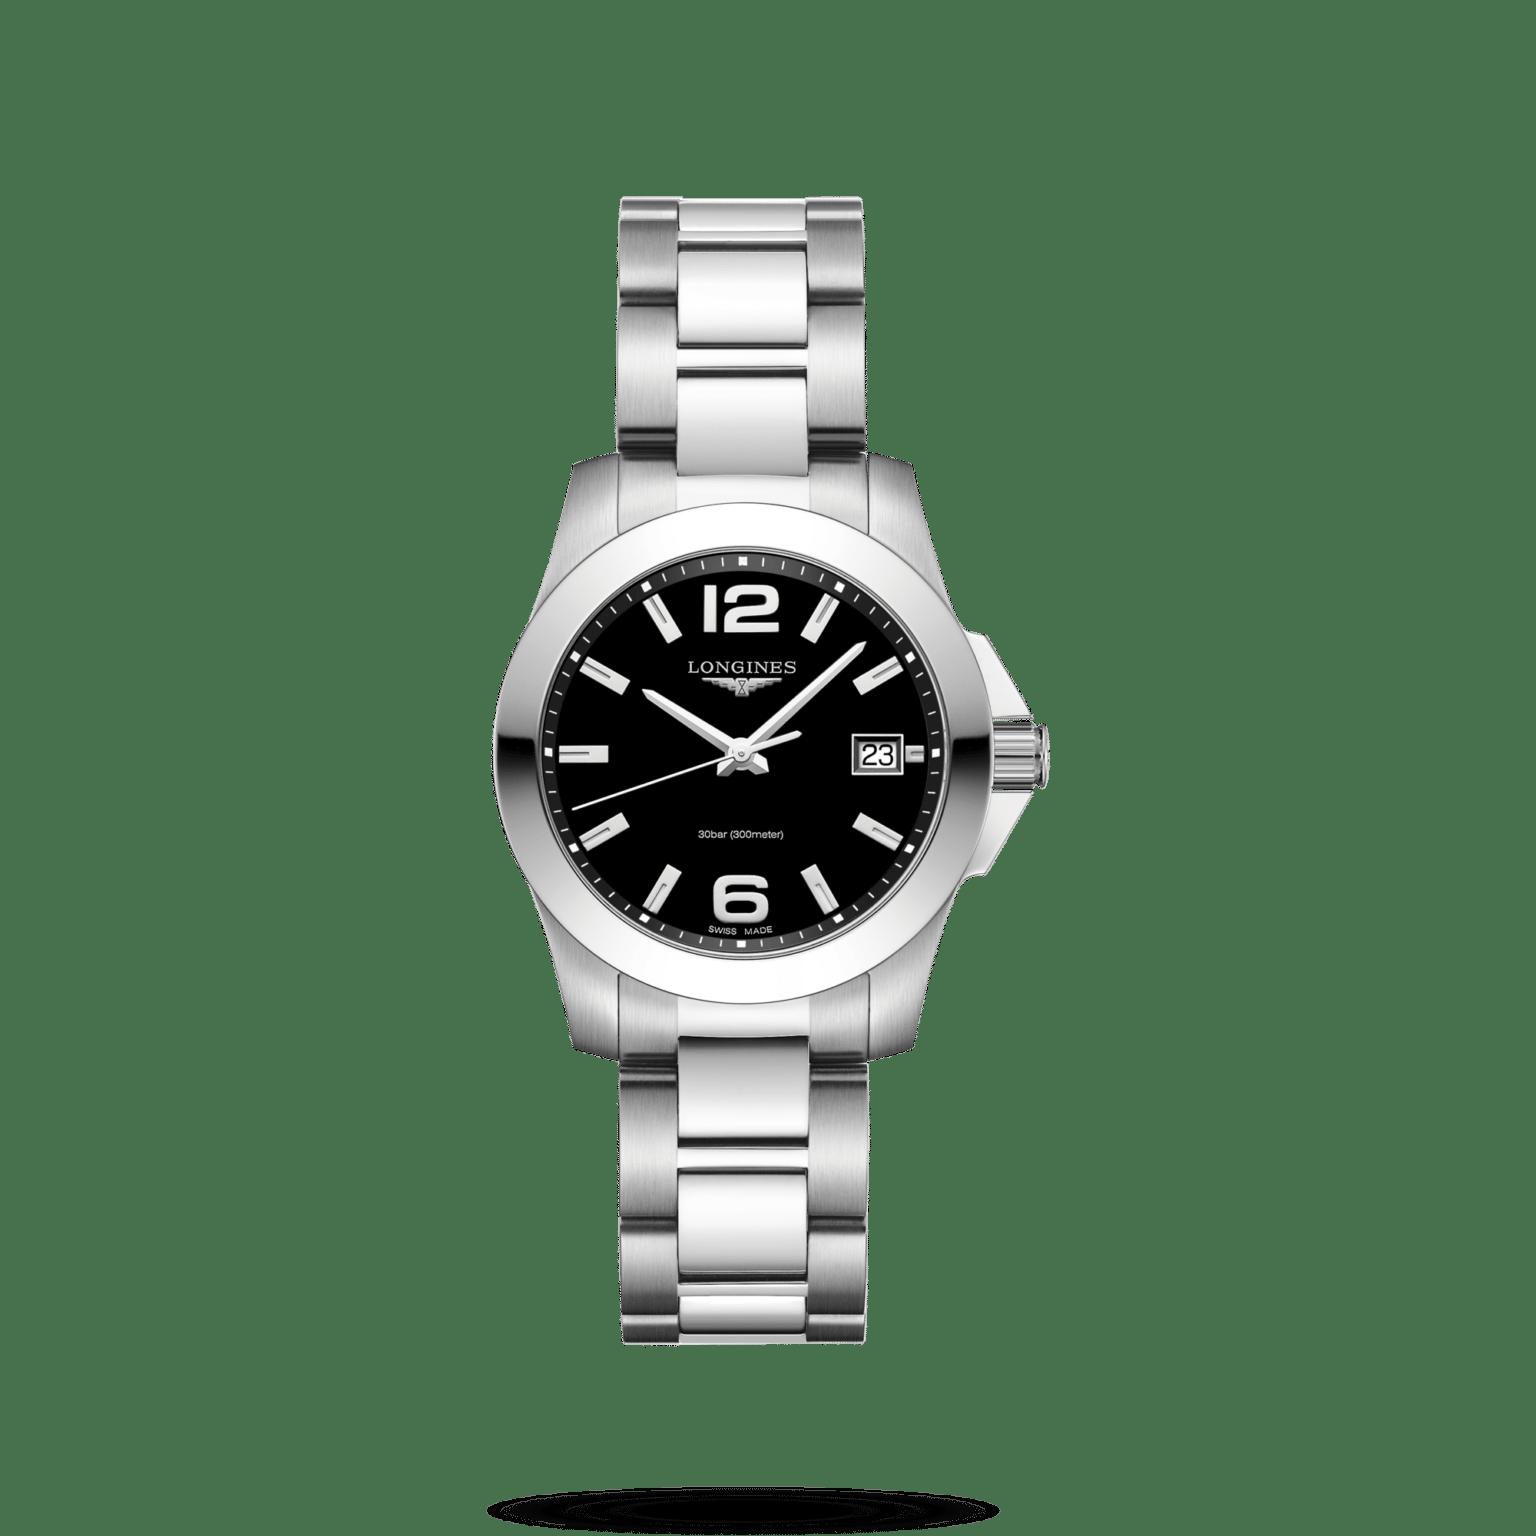 Longines – Conquest – Conquest - Wagner Bijouterie Uhren